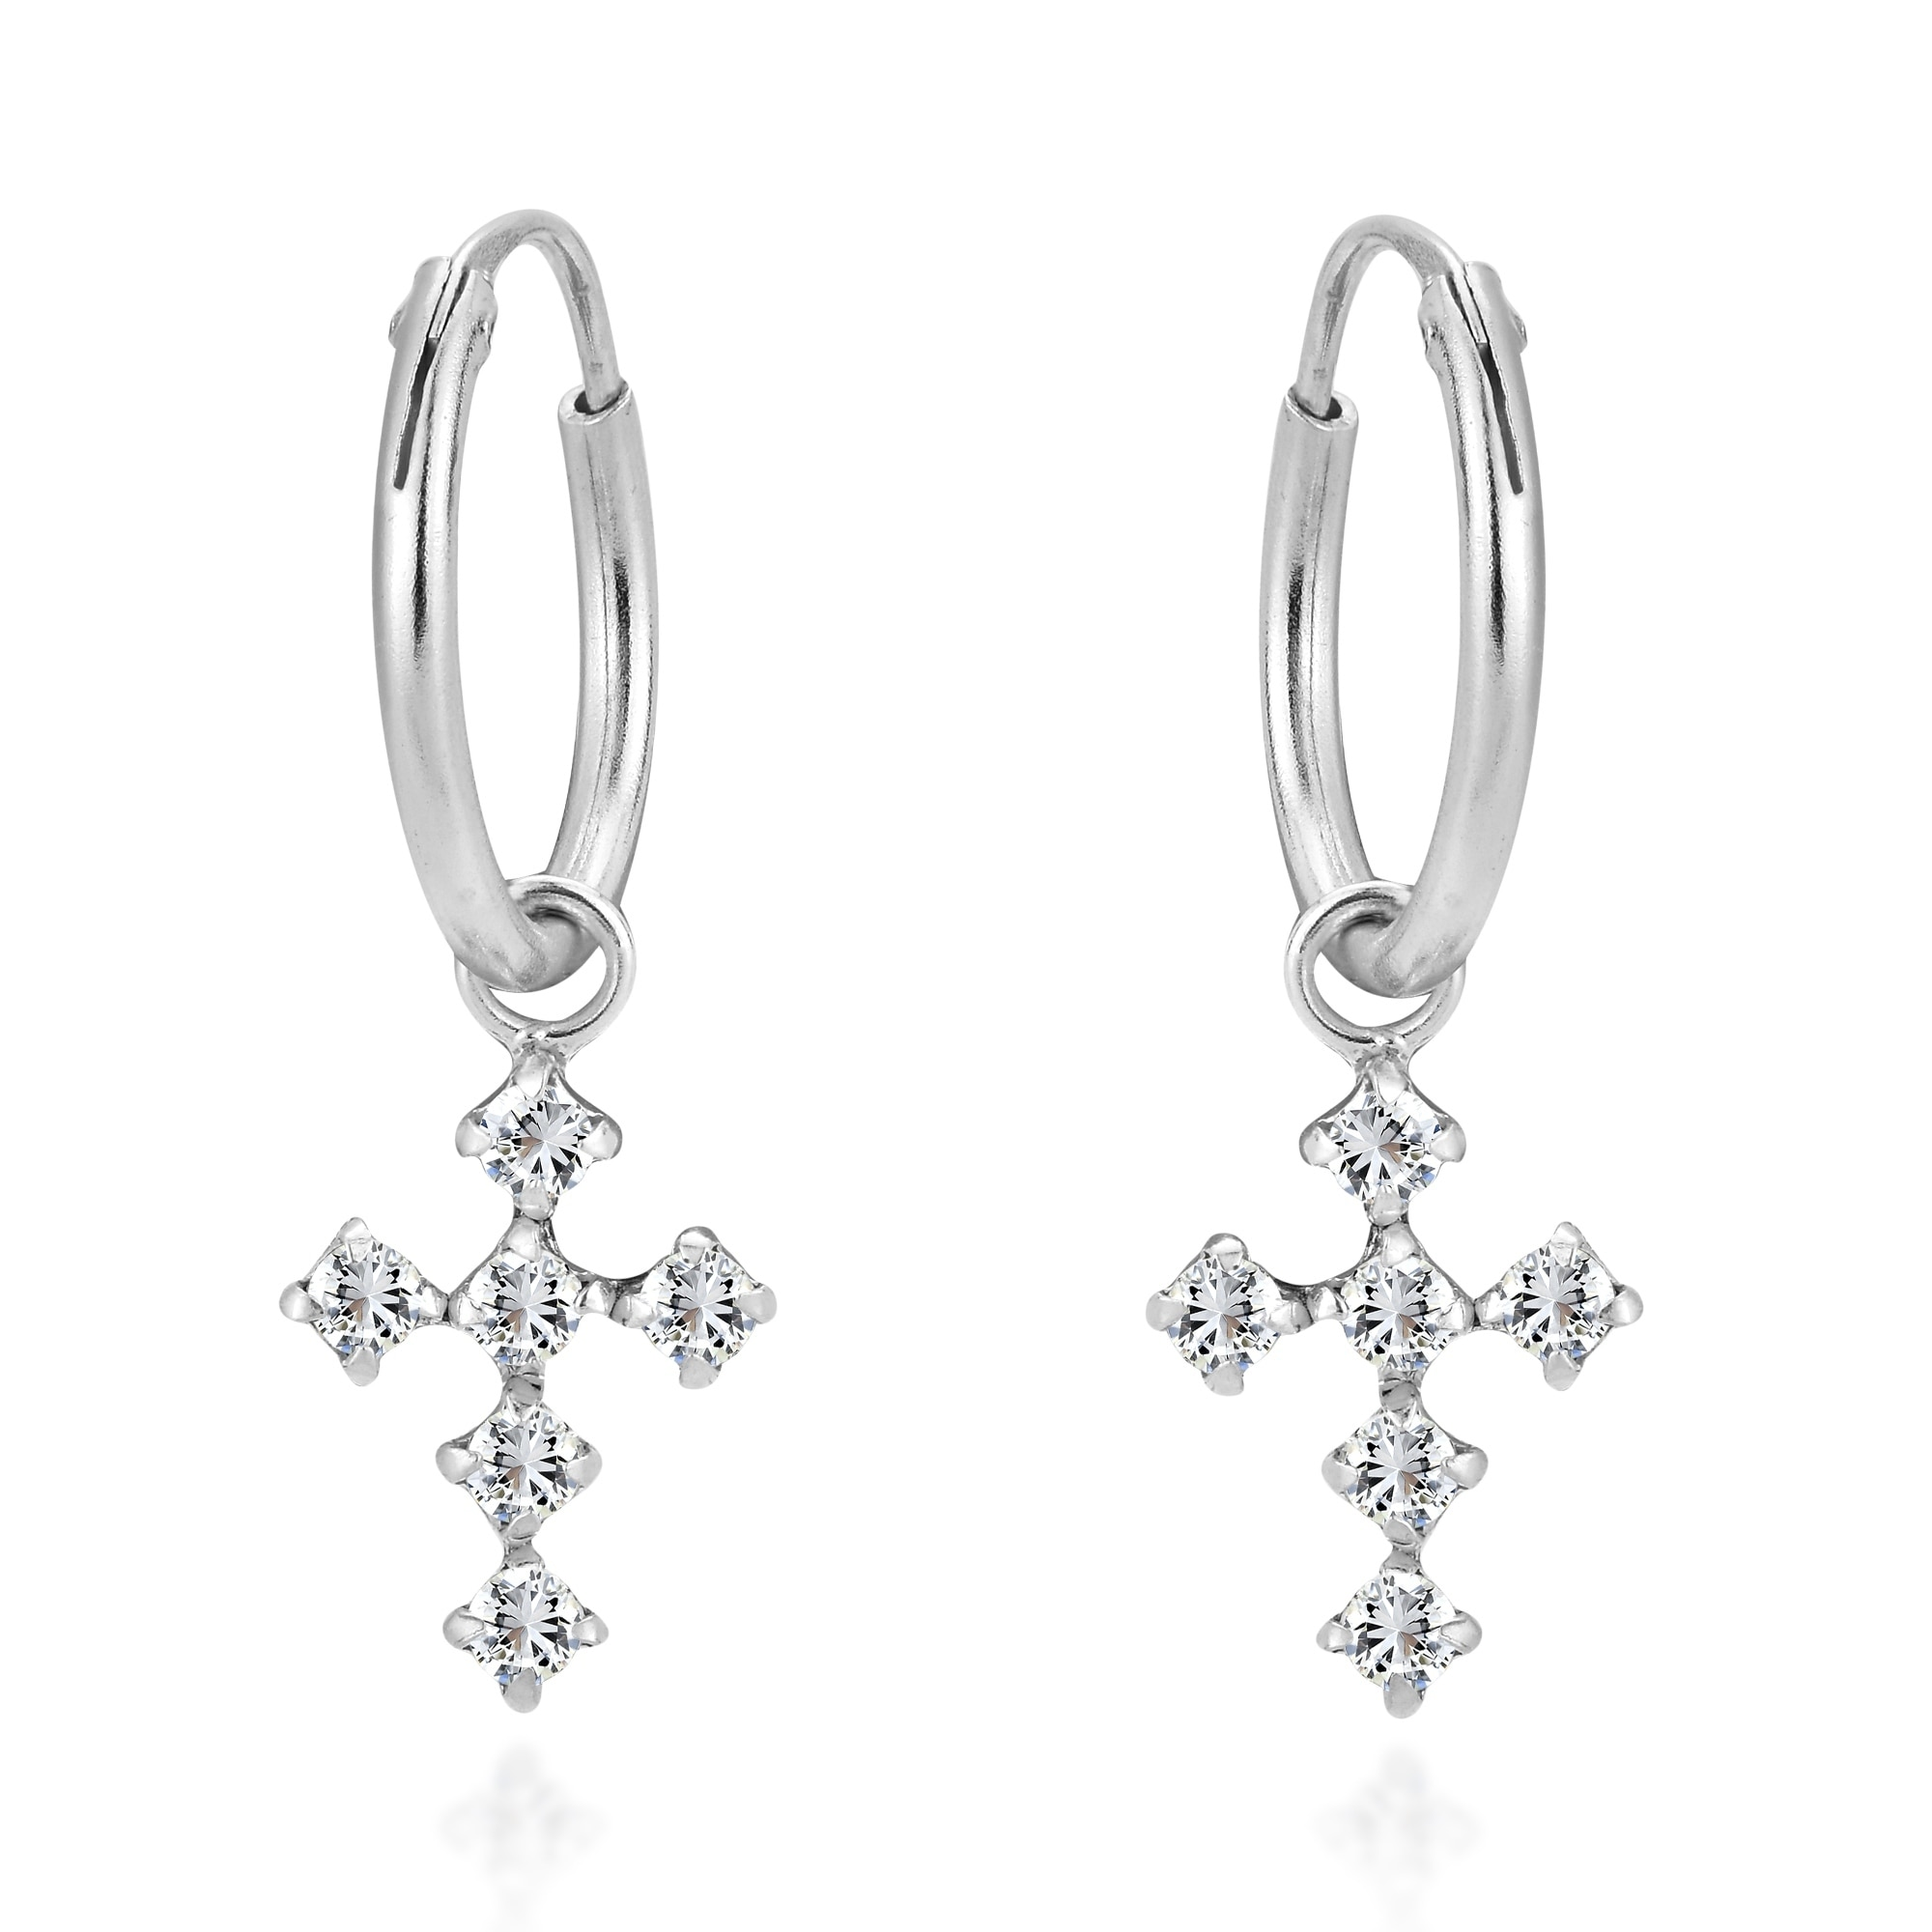 925 Sterling Silver Rhodium-plated Polished CZ Cross Hoop Earrings